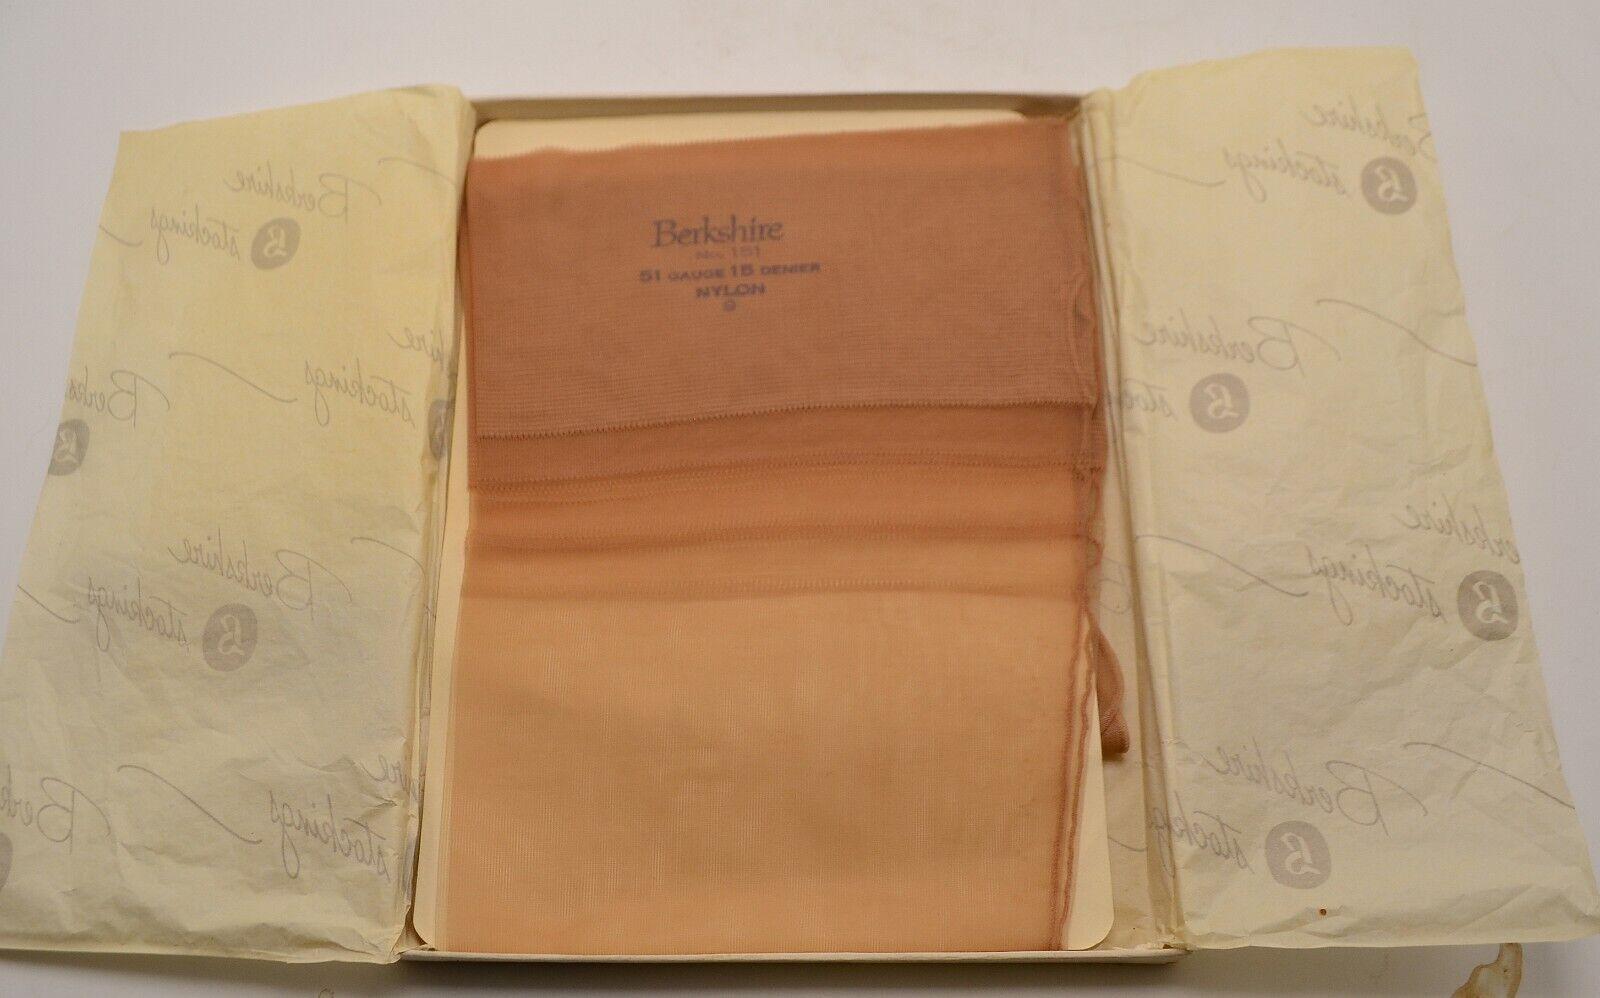 Twinkle beige Vintage 1950s Berkshire Nylons  Stockings 2 Pair - Size 11 L - New in Box